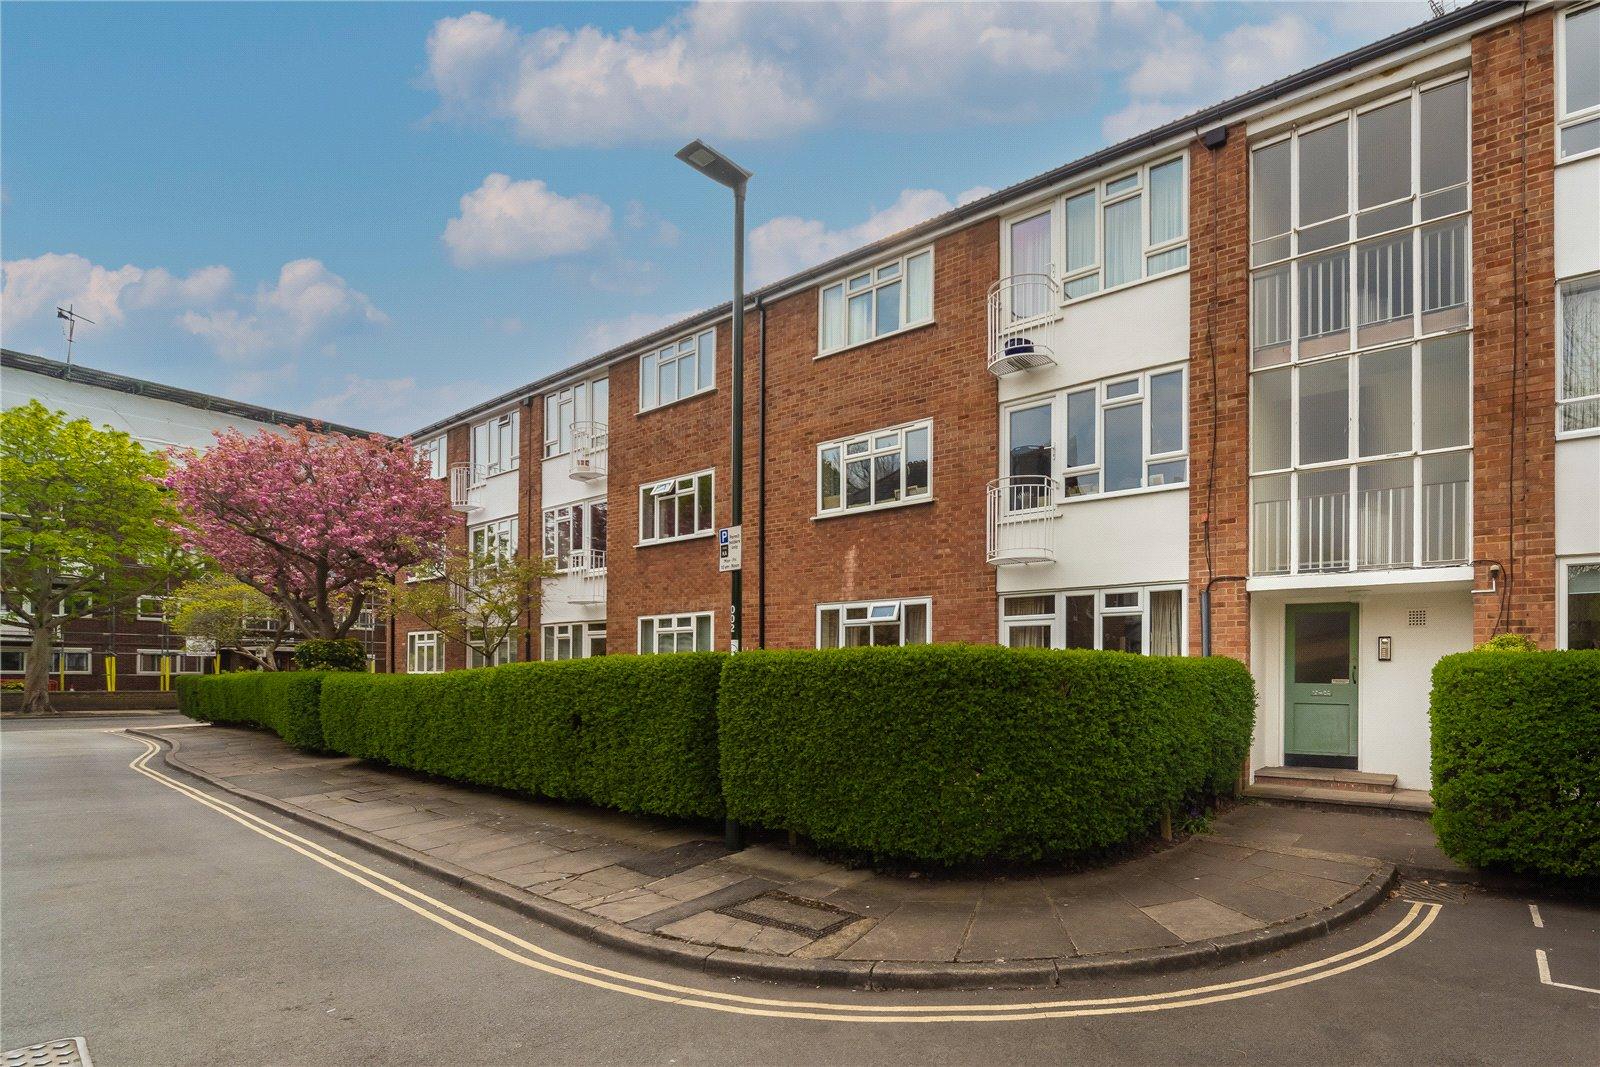 Lichfield Road, Kew, TW9 3EH - Antony Roberts